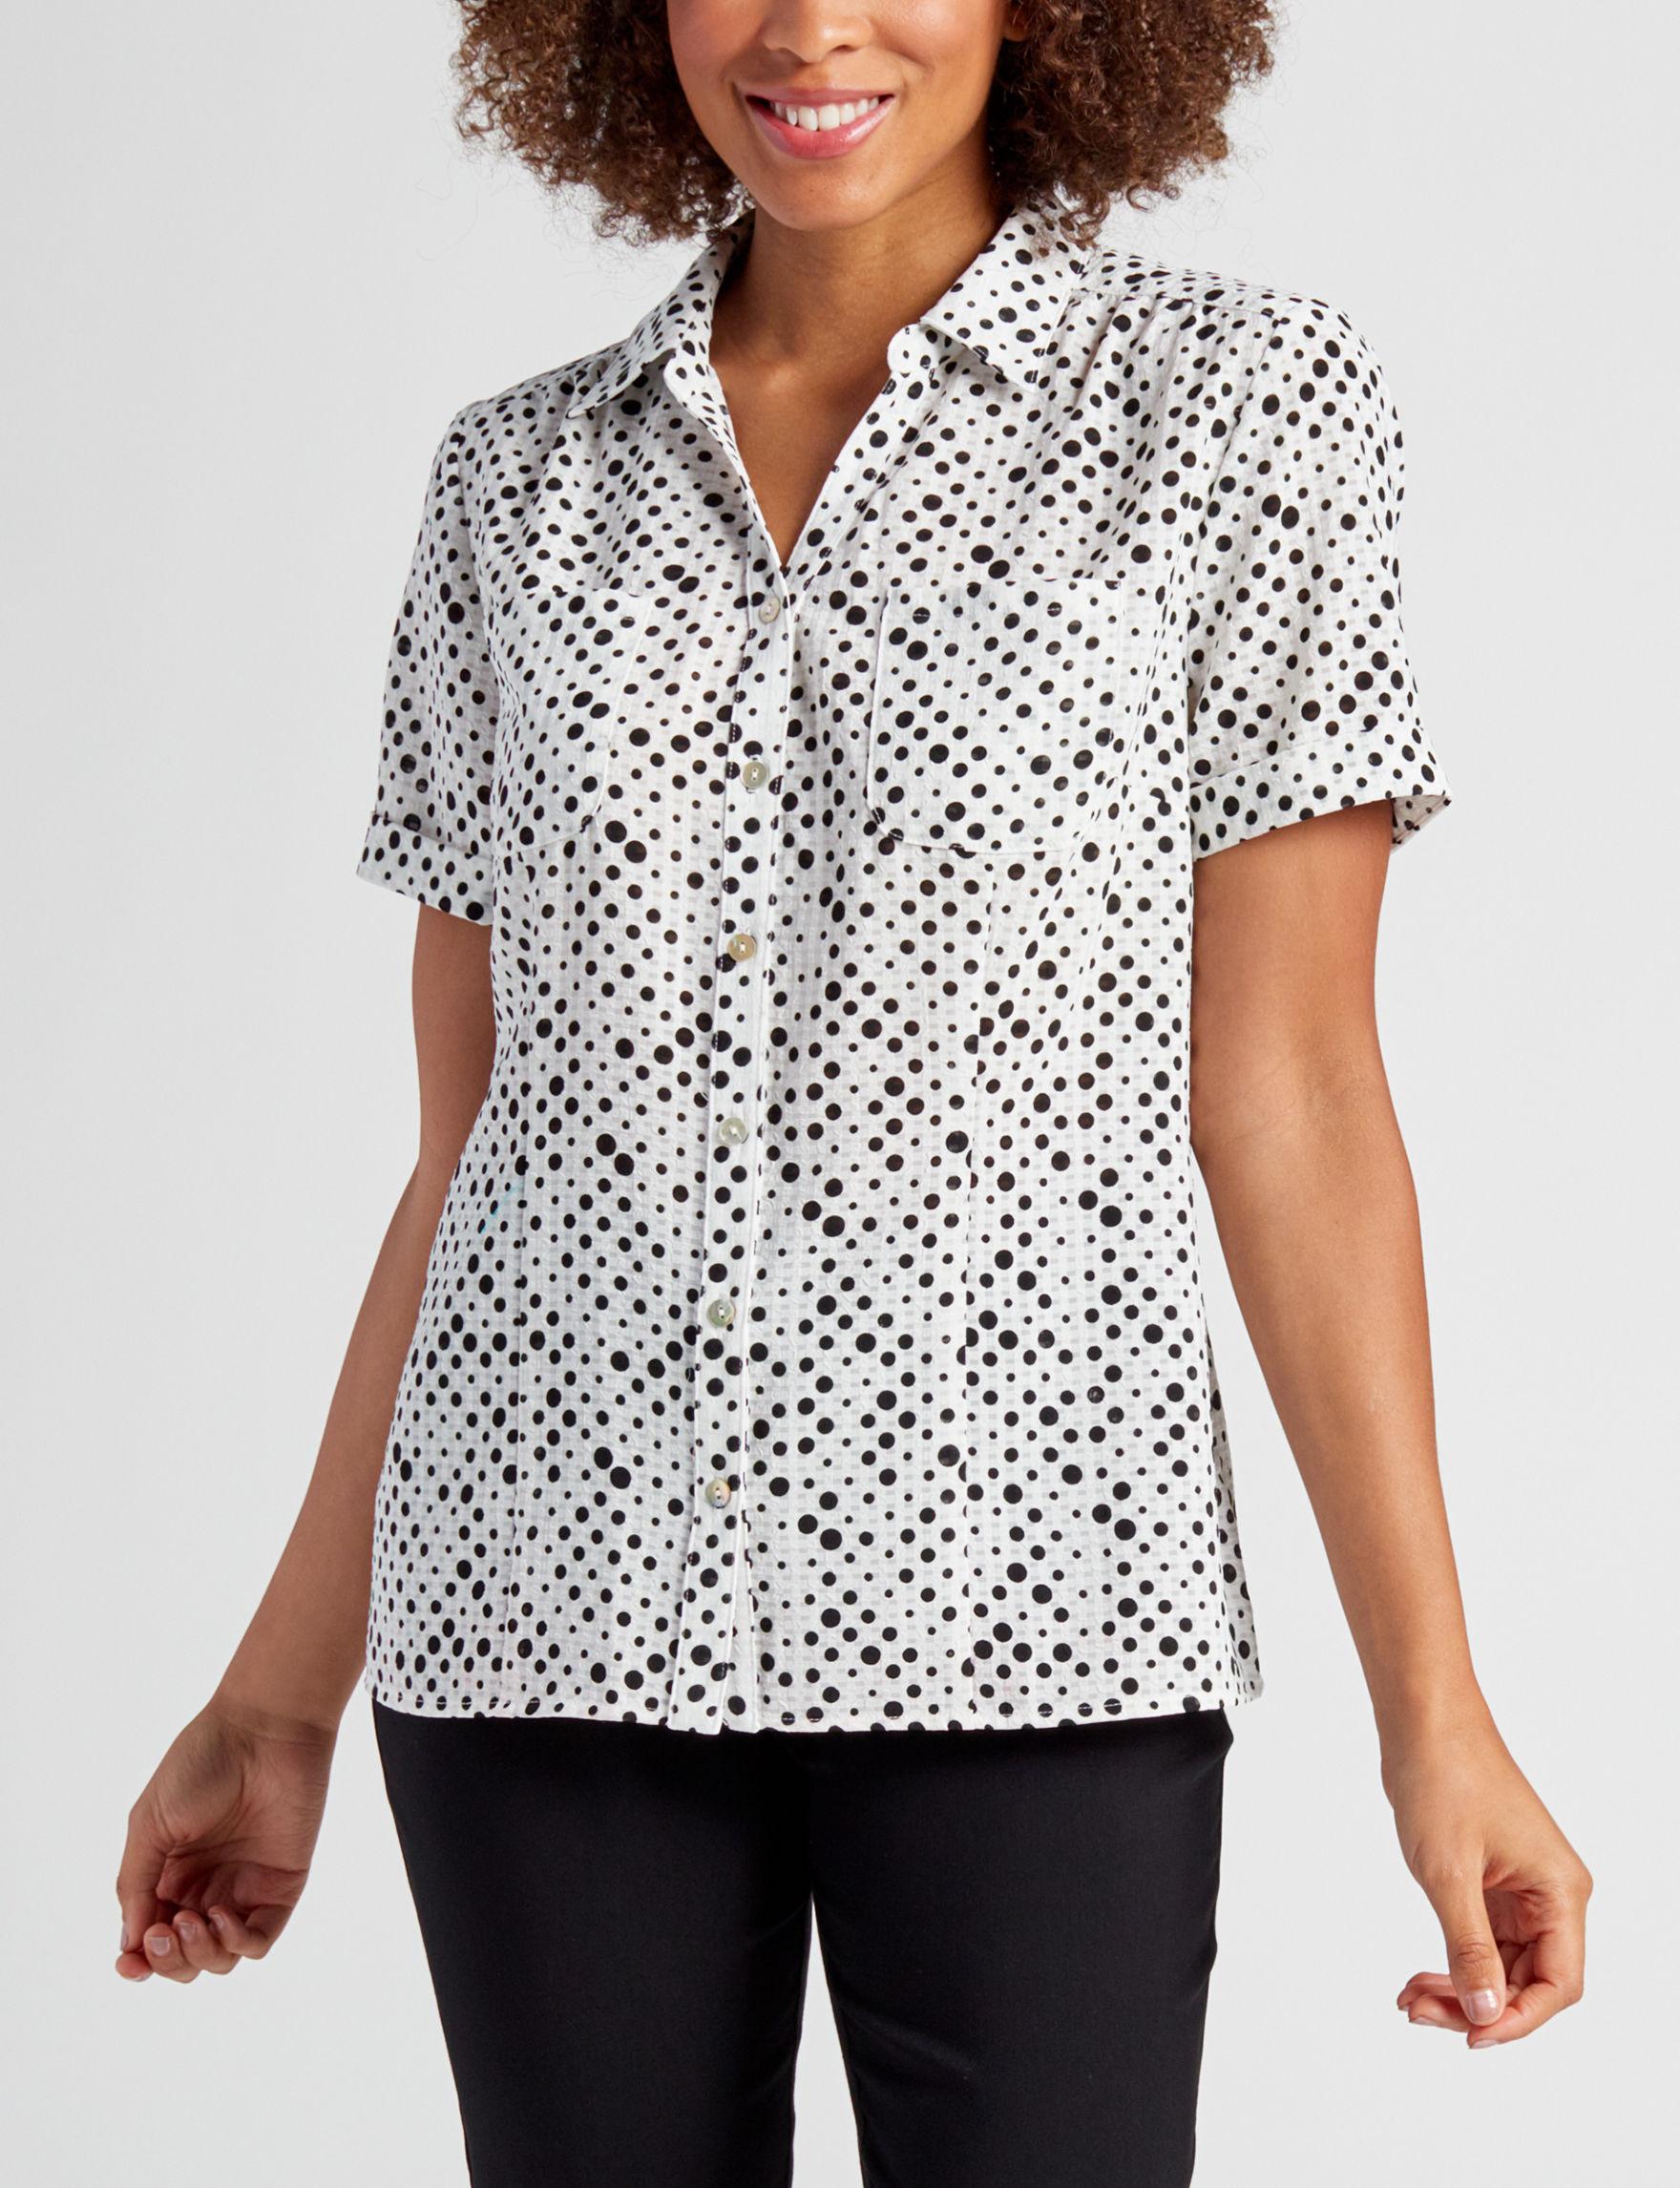 Rebecca Malone Black / Cream Shirts & Blouses